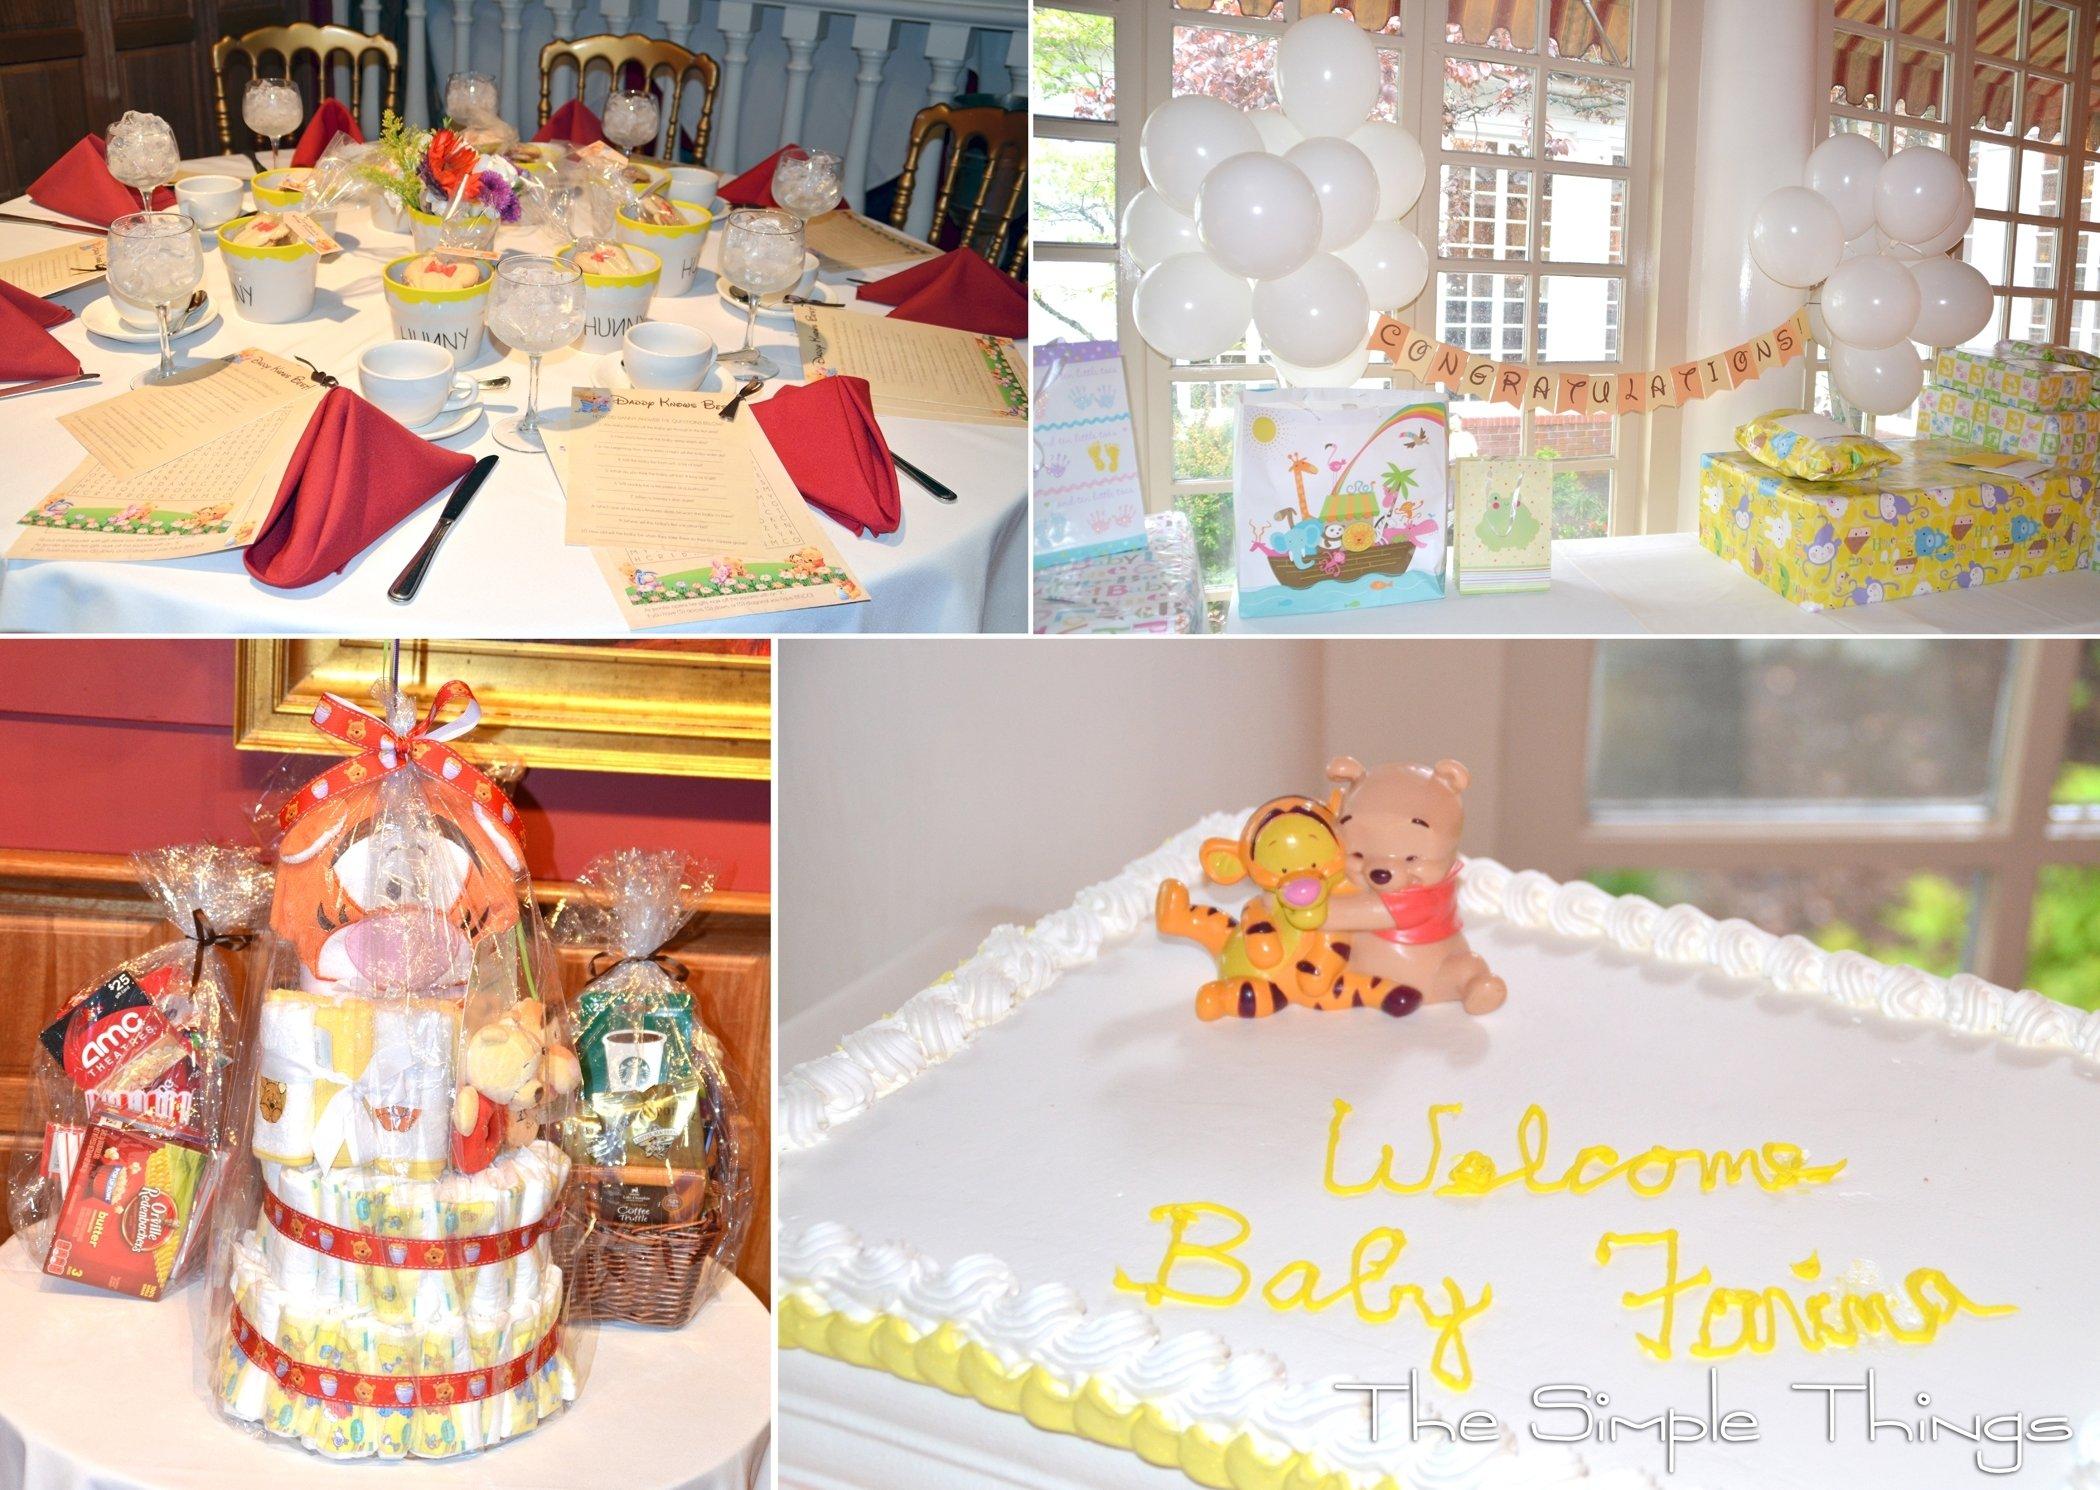 10 Stunning Winnie The Pooh Baby Shower Ideas winnie the pooh baby shower decorations baby showers ideas 2021